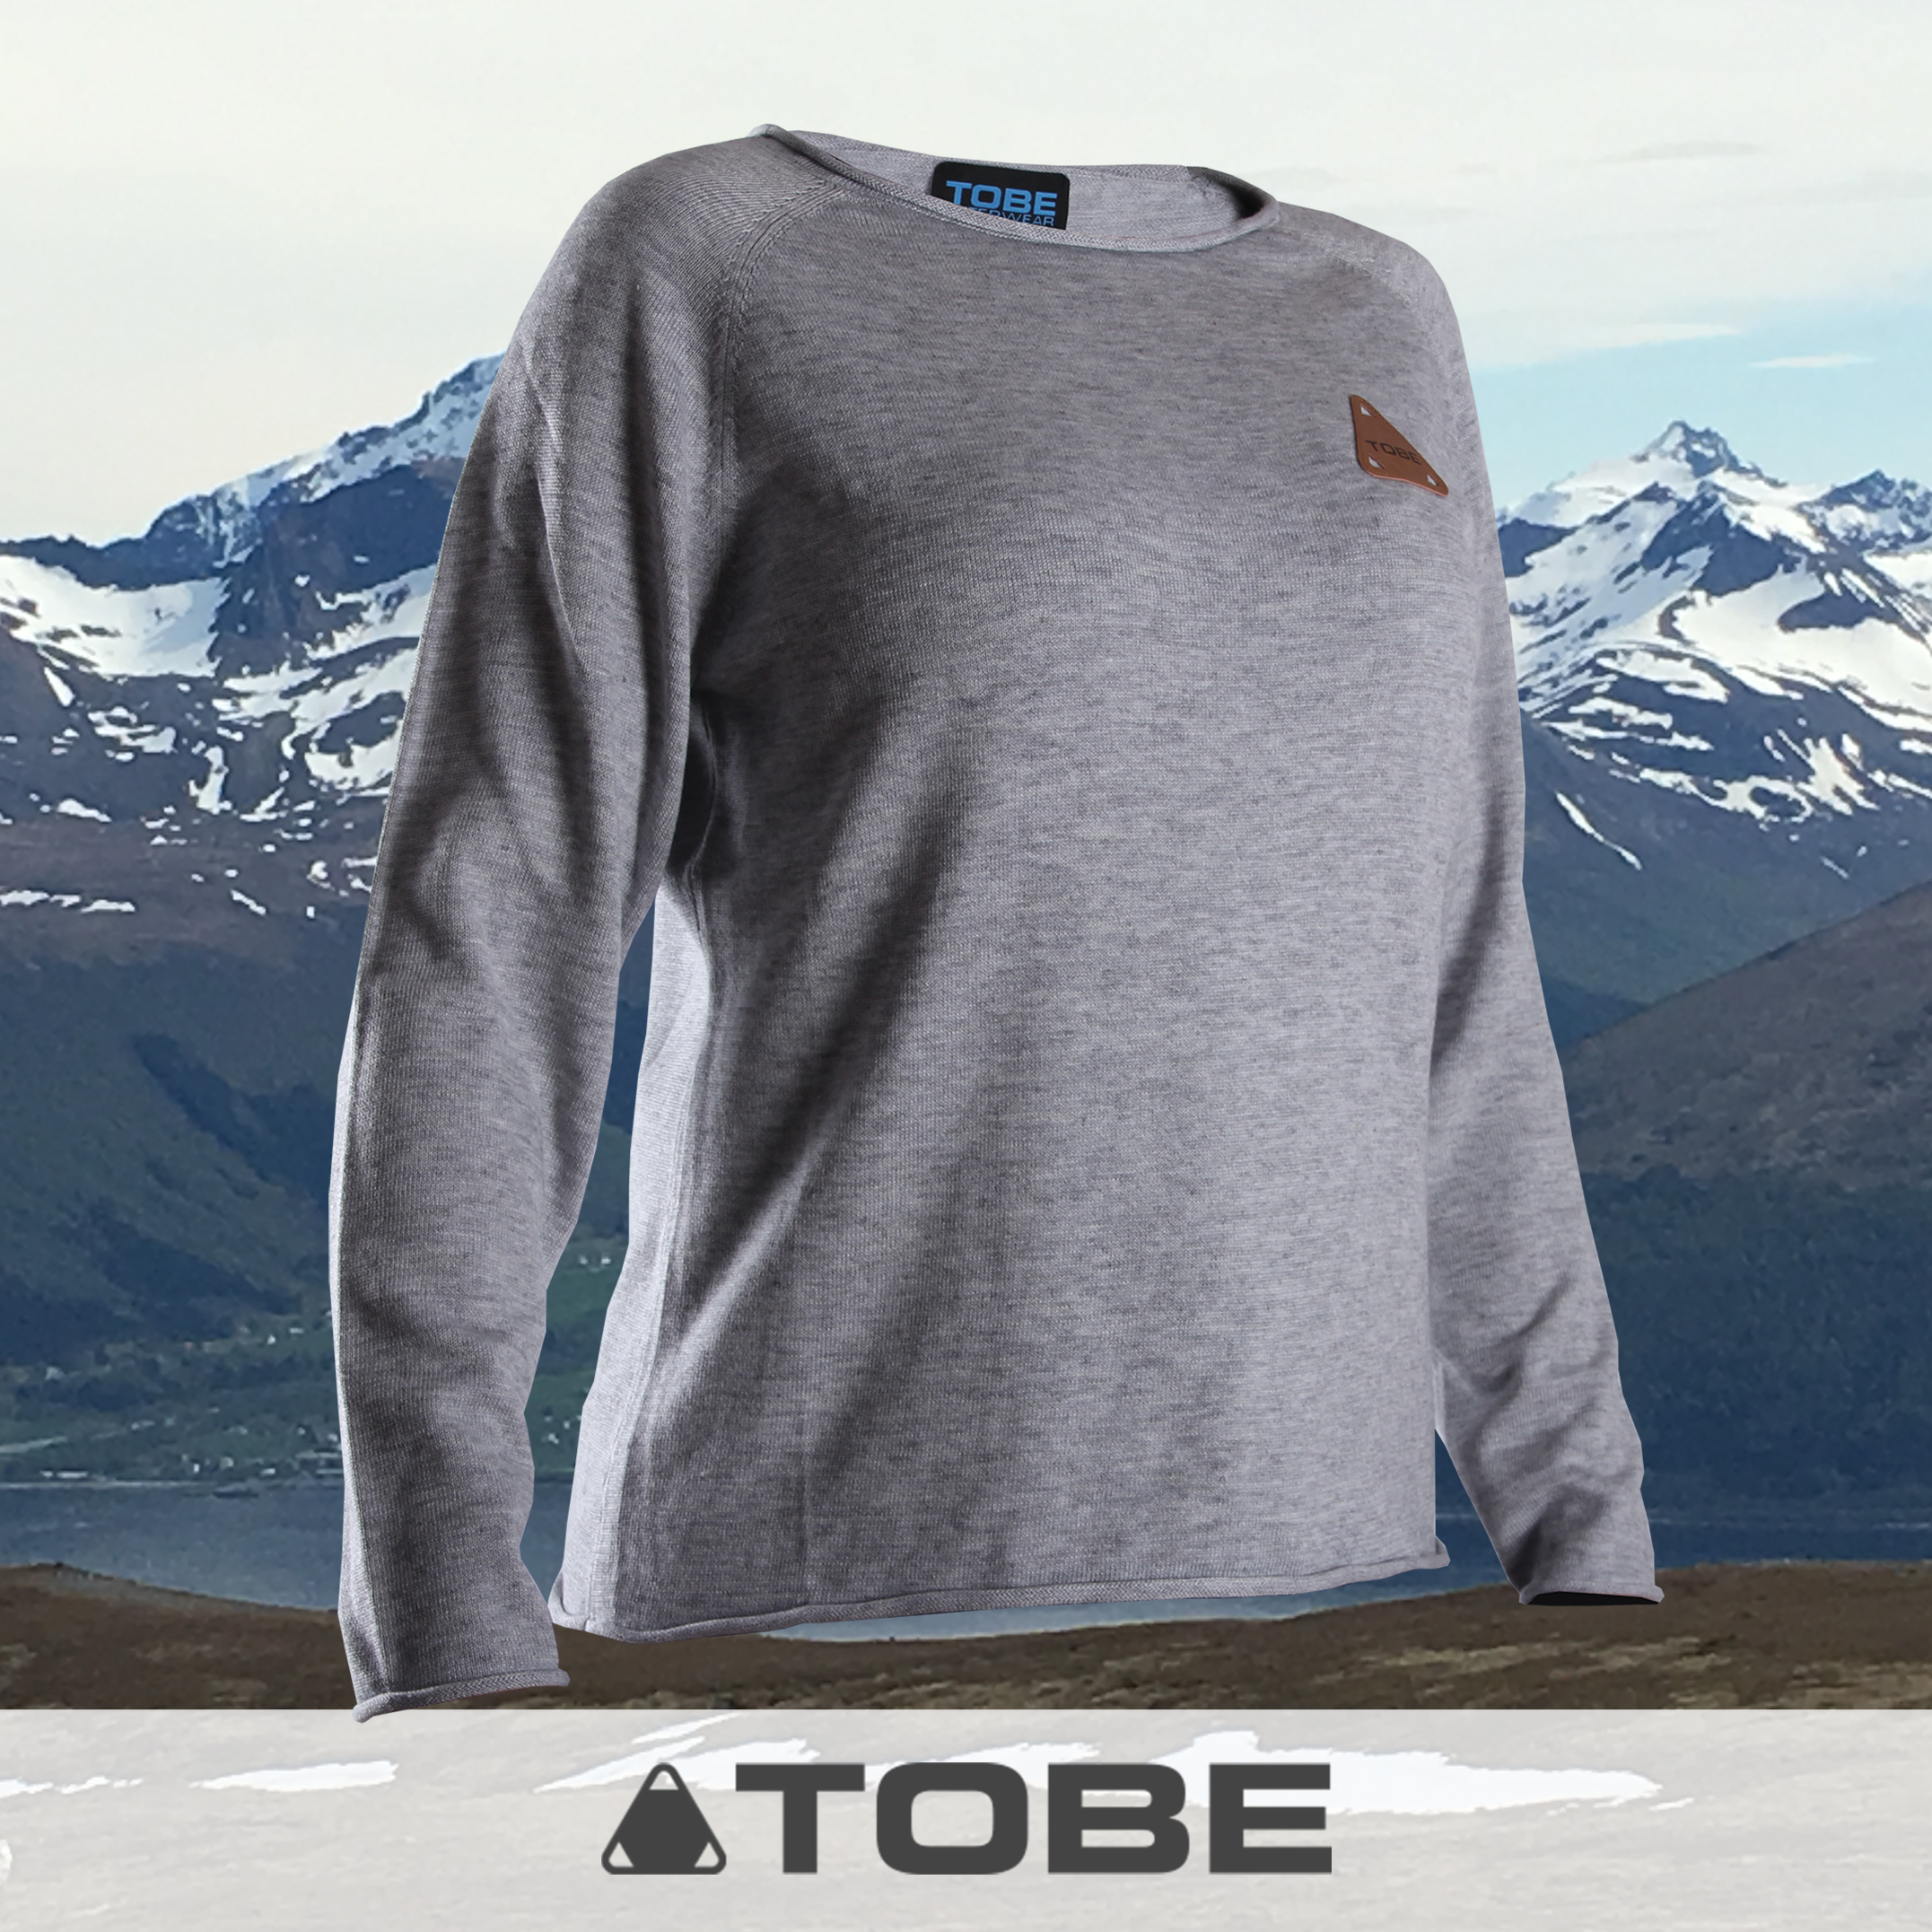 TOBE Casa Sweater - Women's - Warm, comfortable organic cotton ...